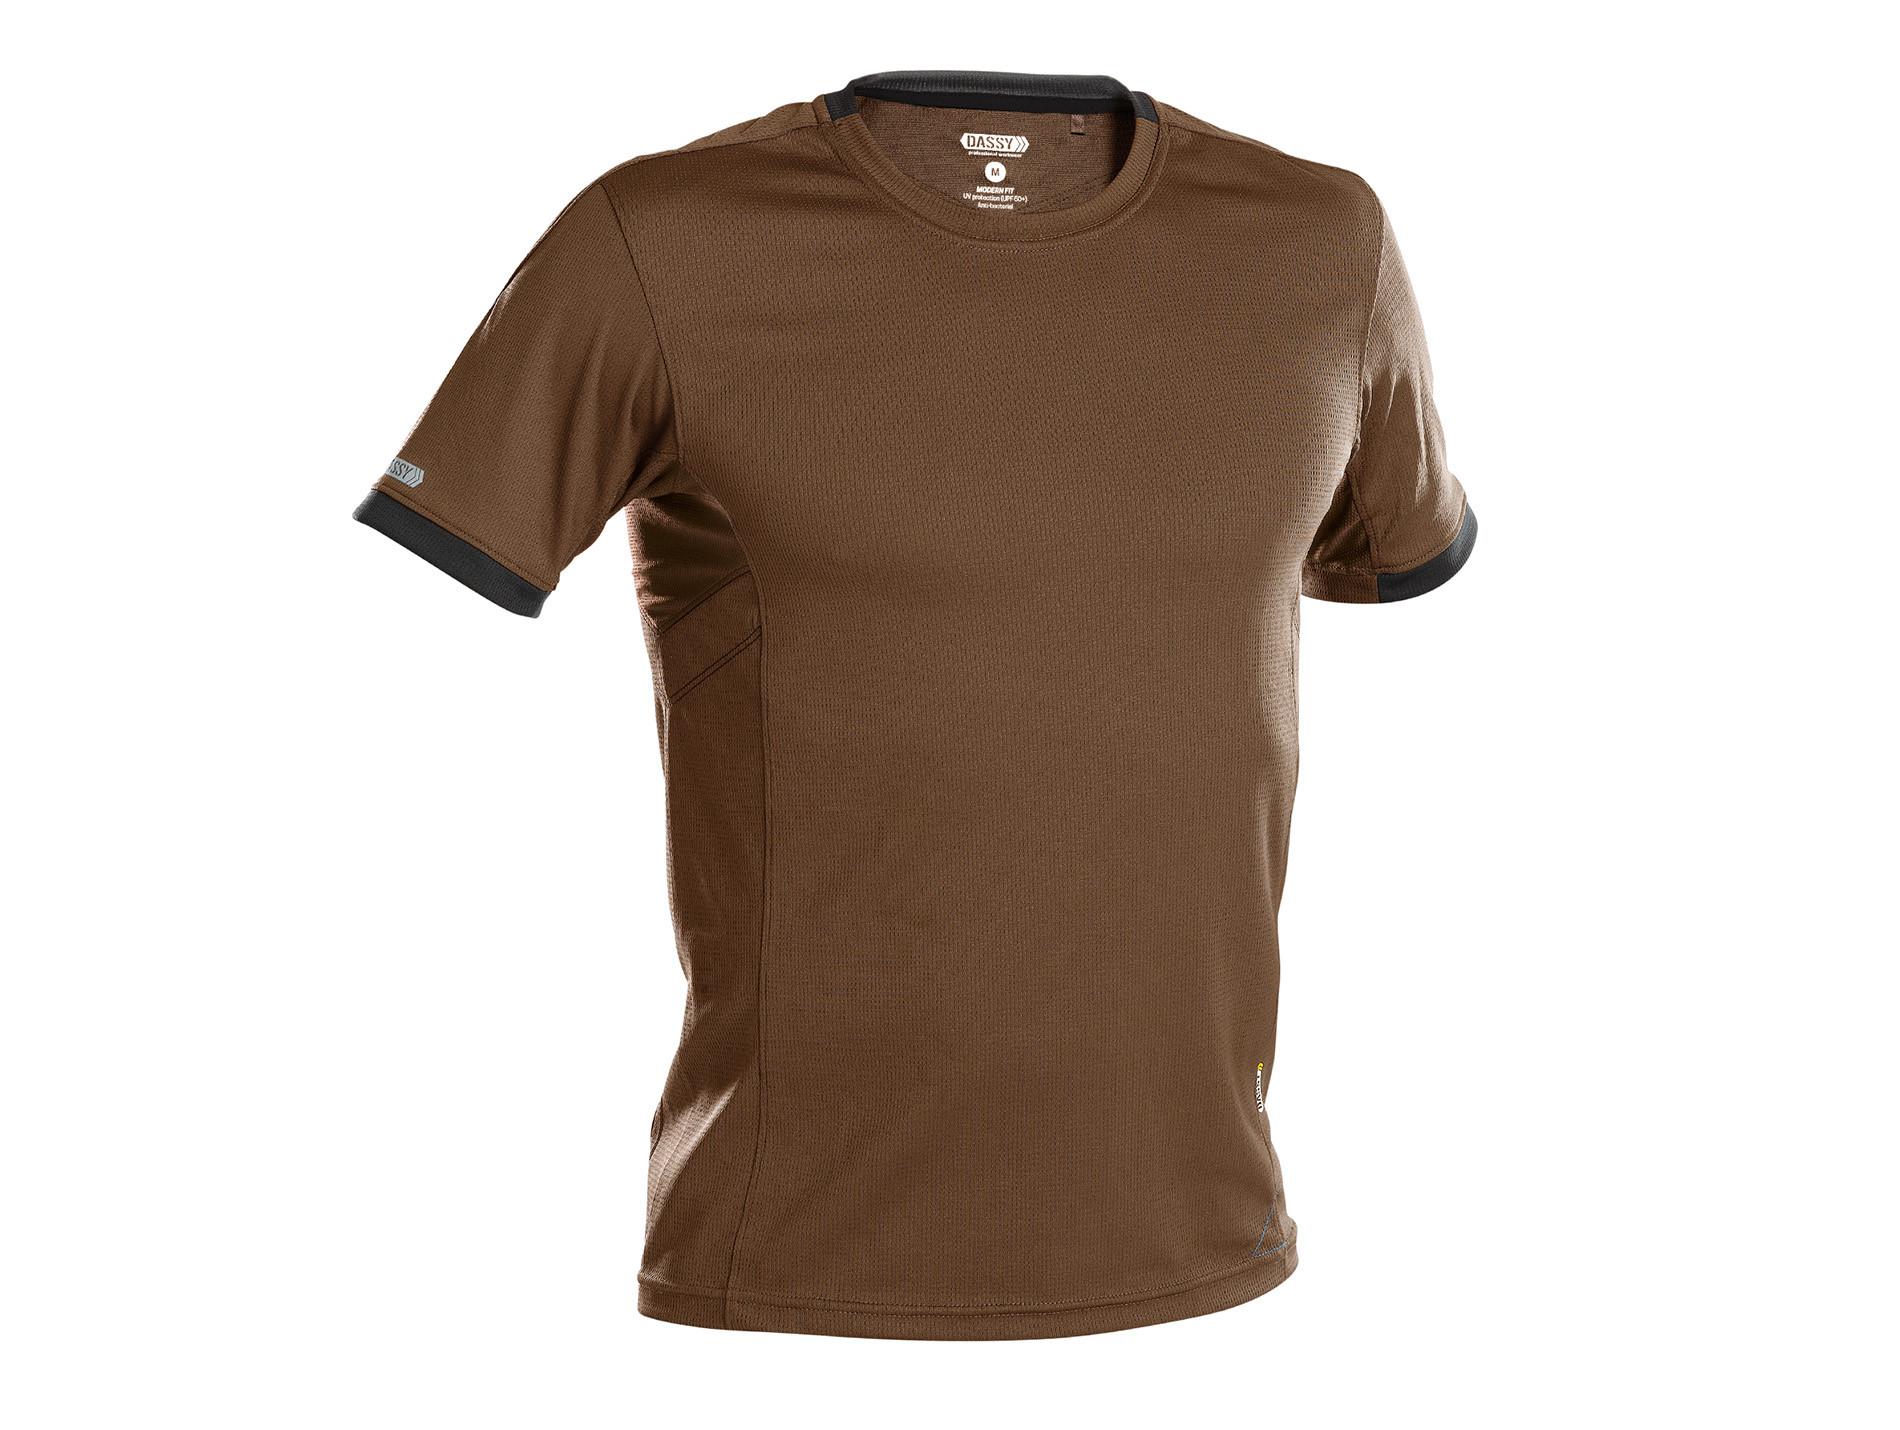 T-shirt DASSY® Nexus Camel/gris